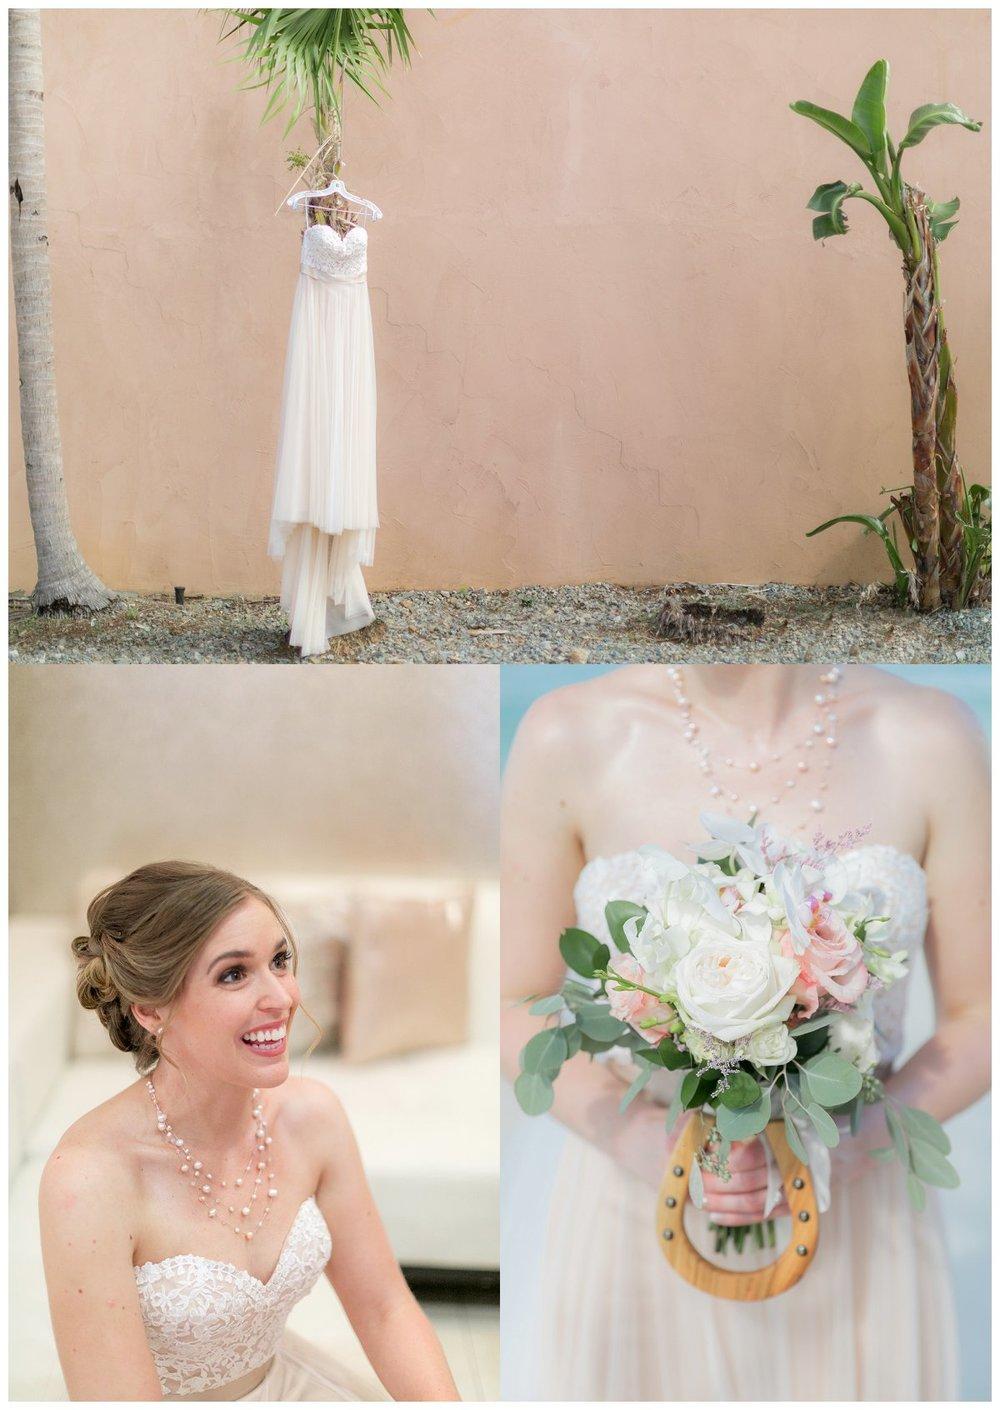 st-thomas-salon-for-a-wedding